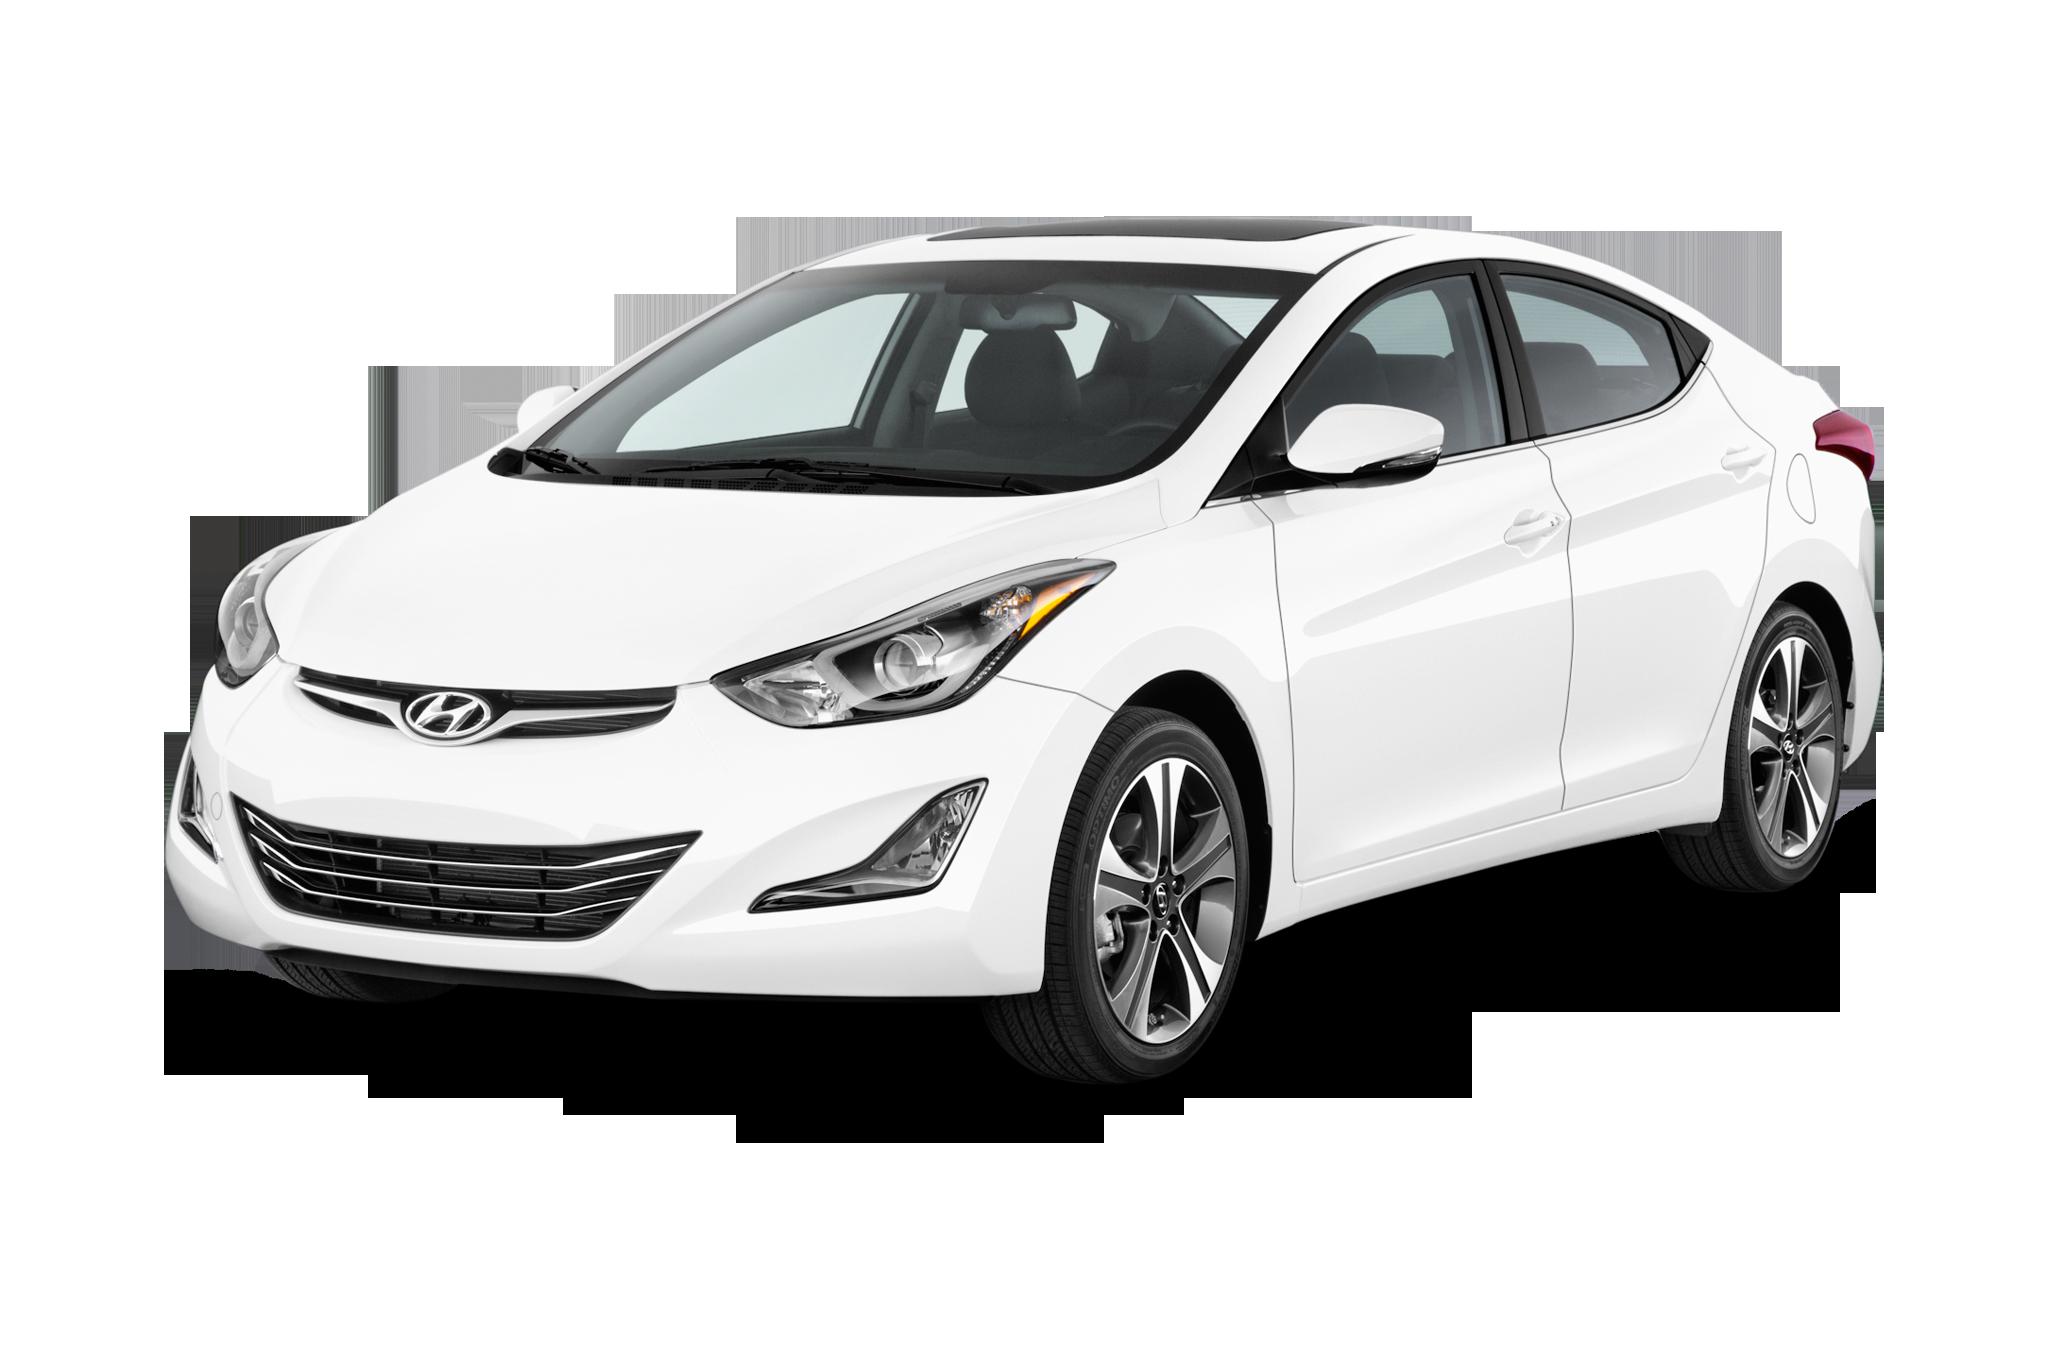 Hyundai Png Image Free Download